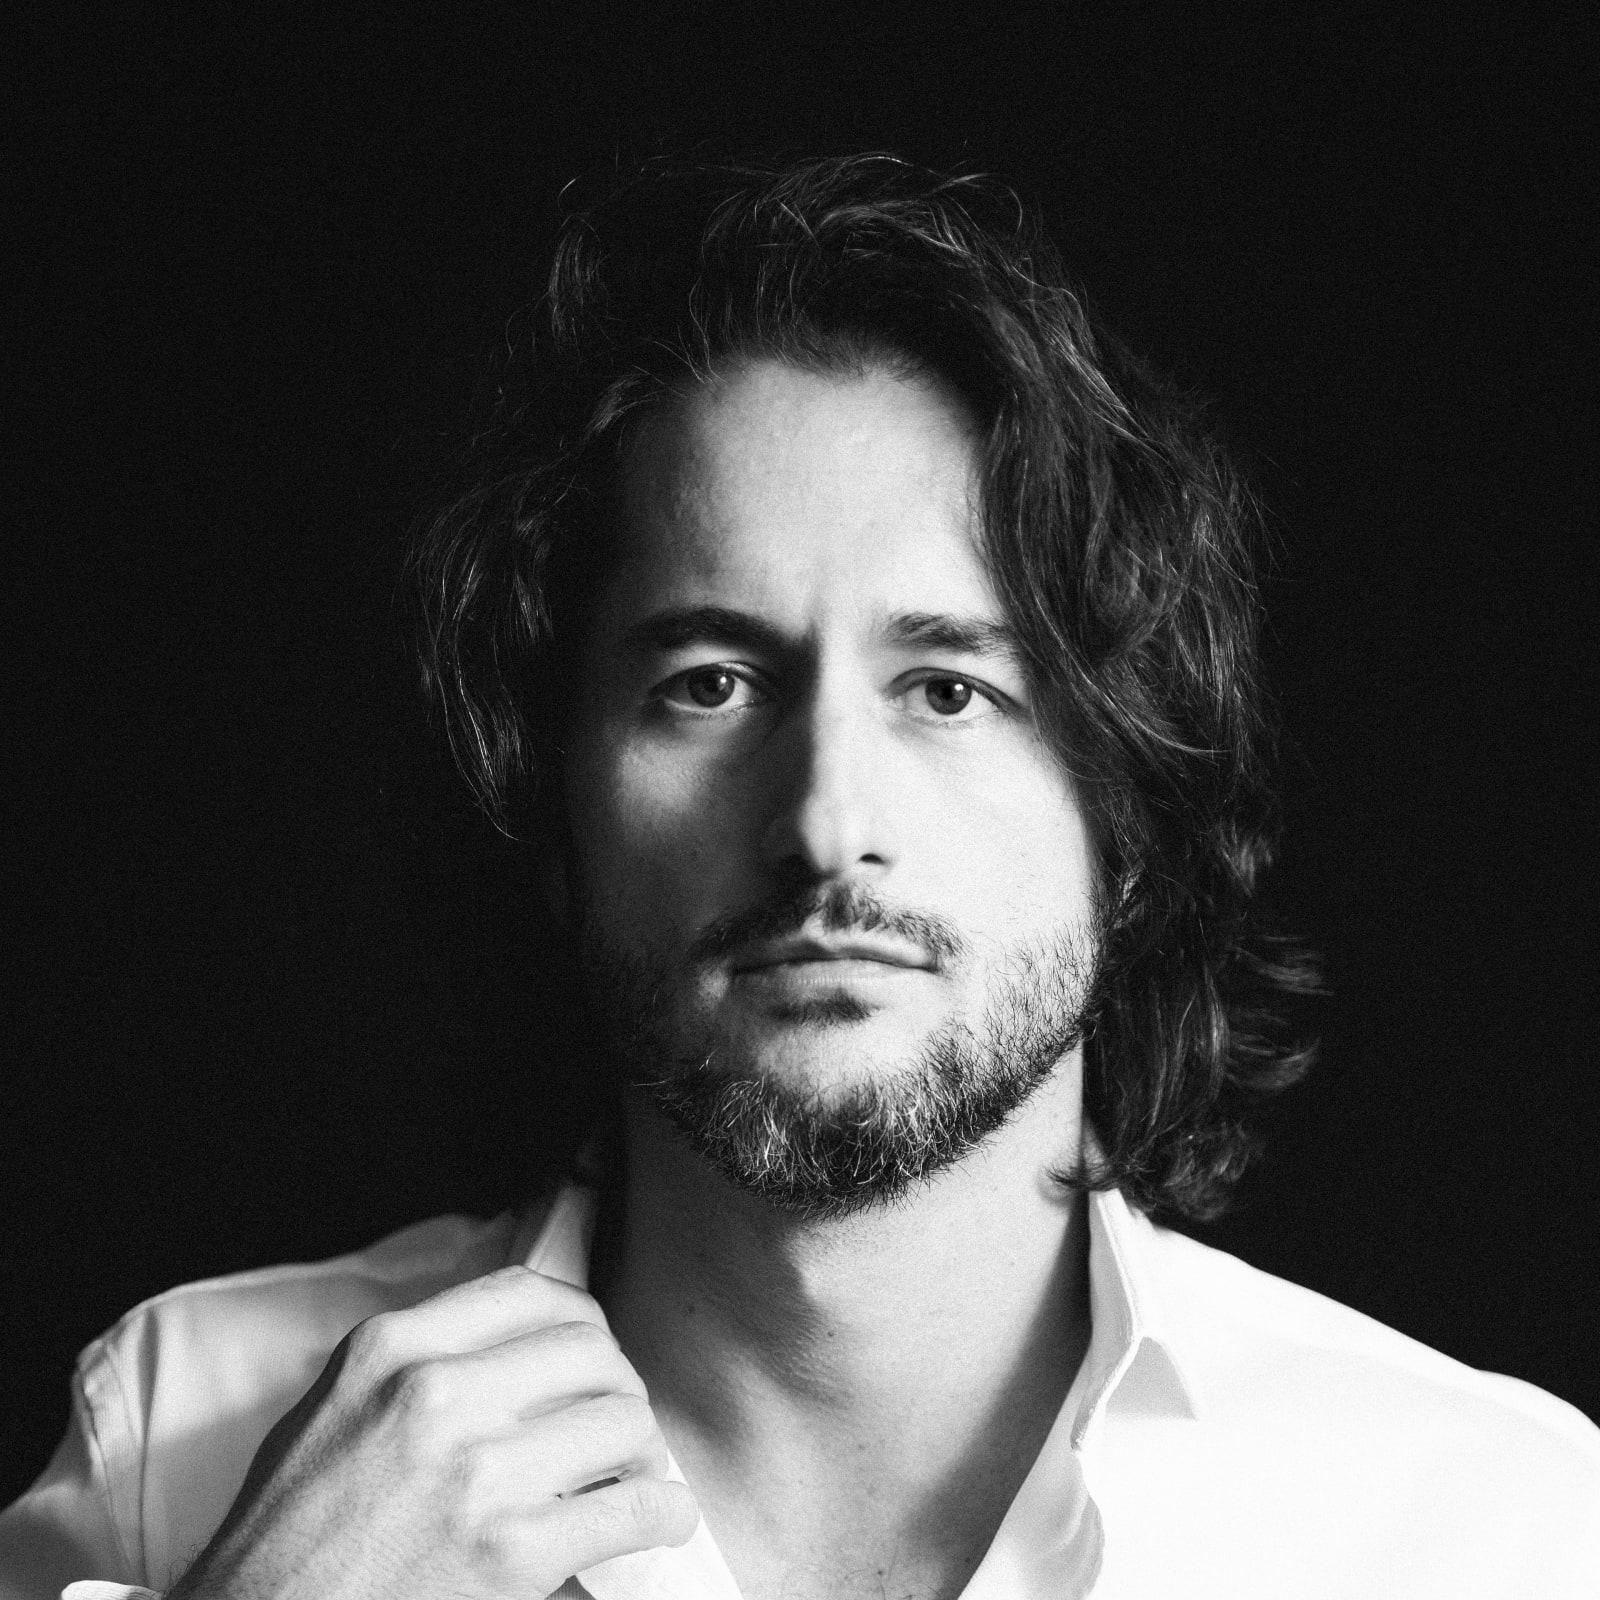 David Aguirre, Creative Director